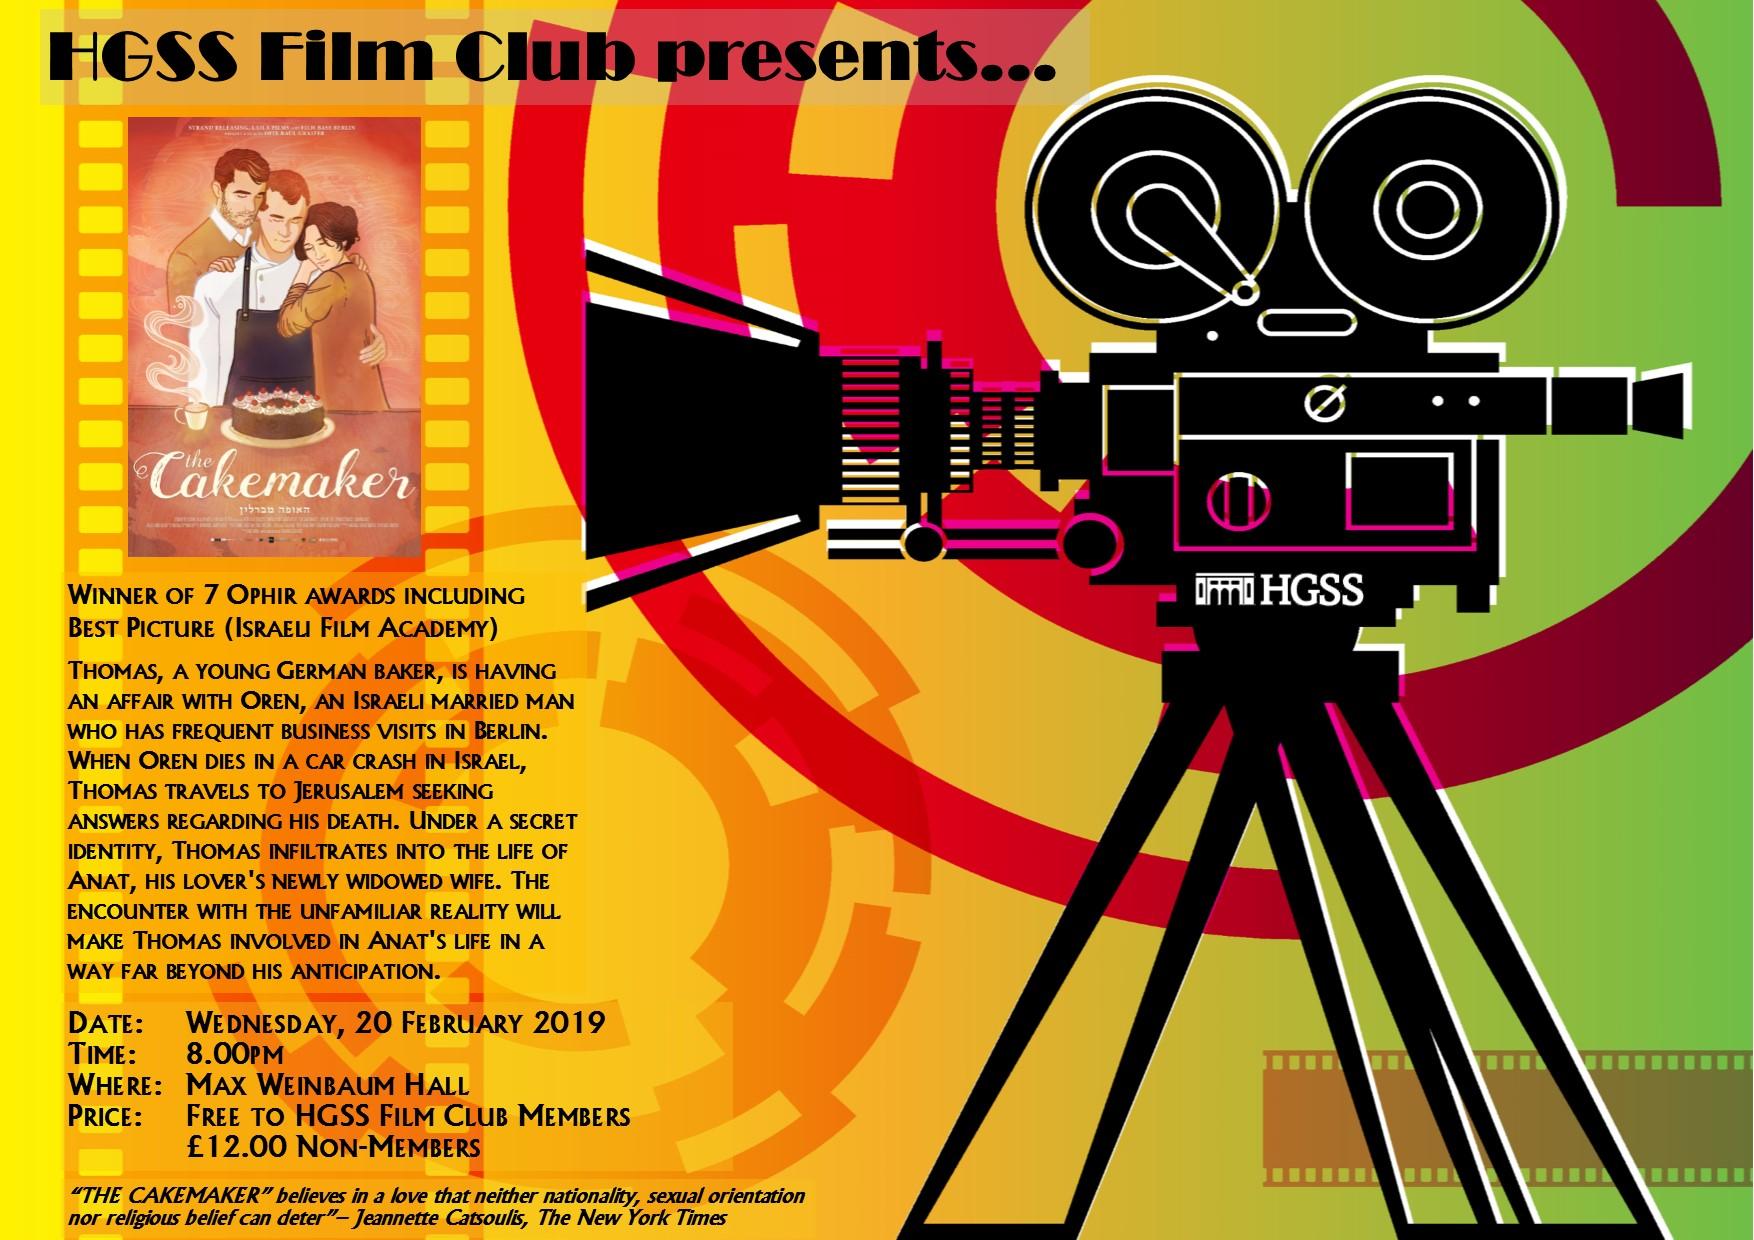 HGSS Film Club @ Max Weinbaum Hall